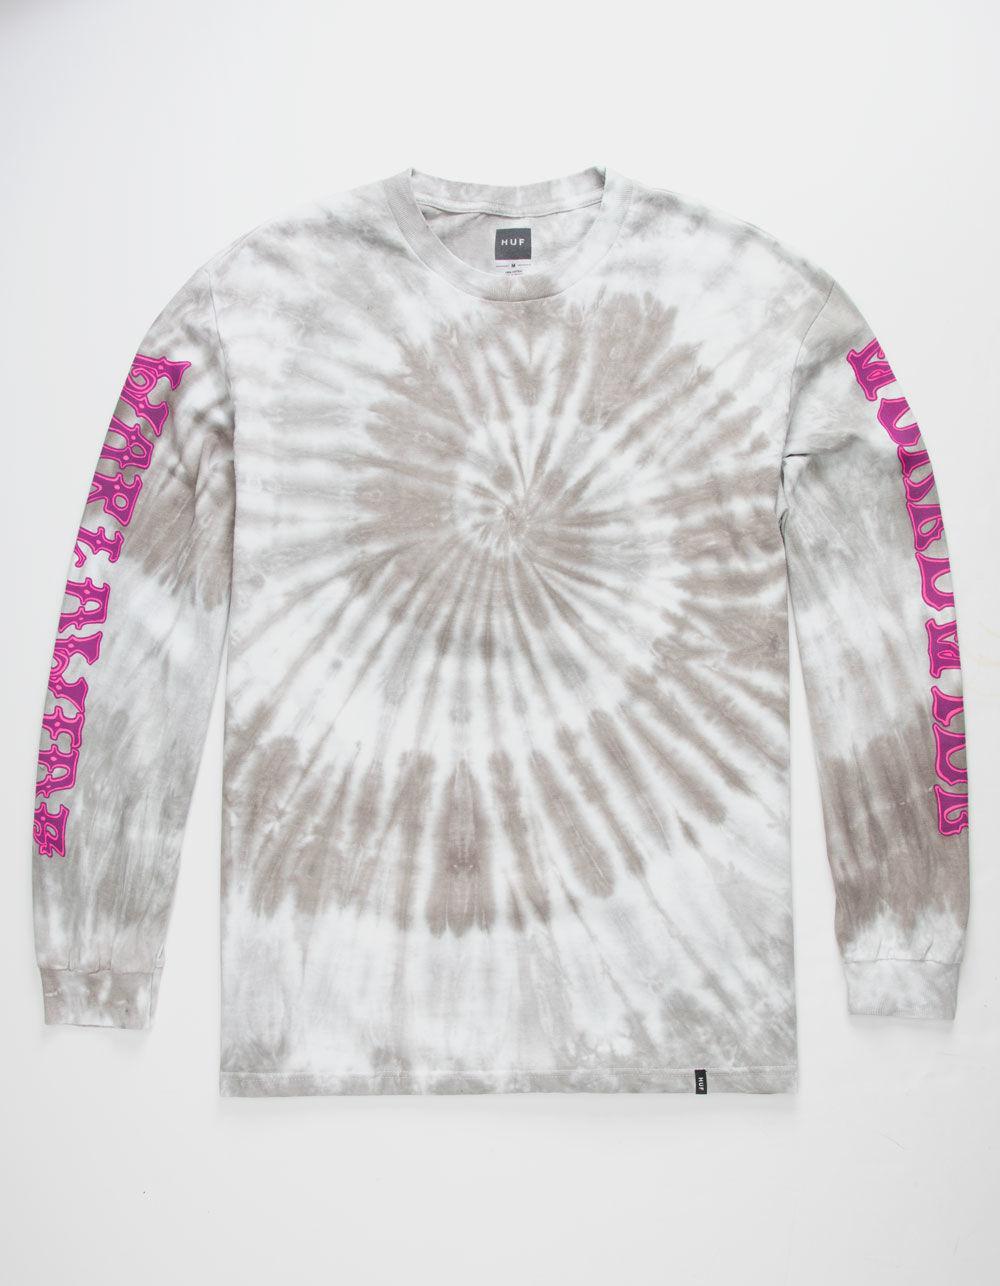 a8a4bb60 Lyst - Huf Freak Street Gray Tie Dye Mens T-shirt in Gray for Men